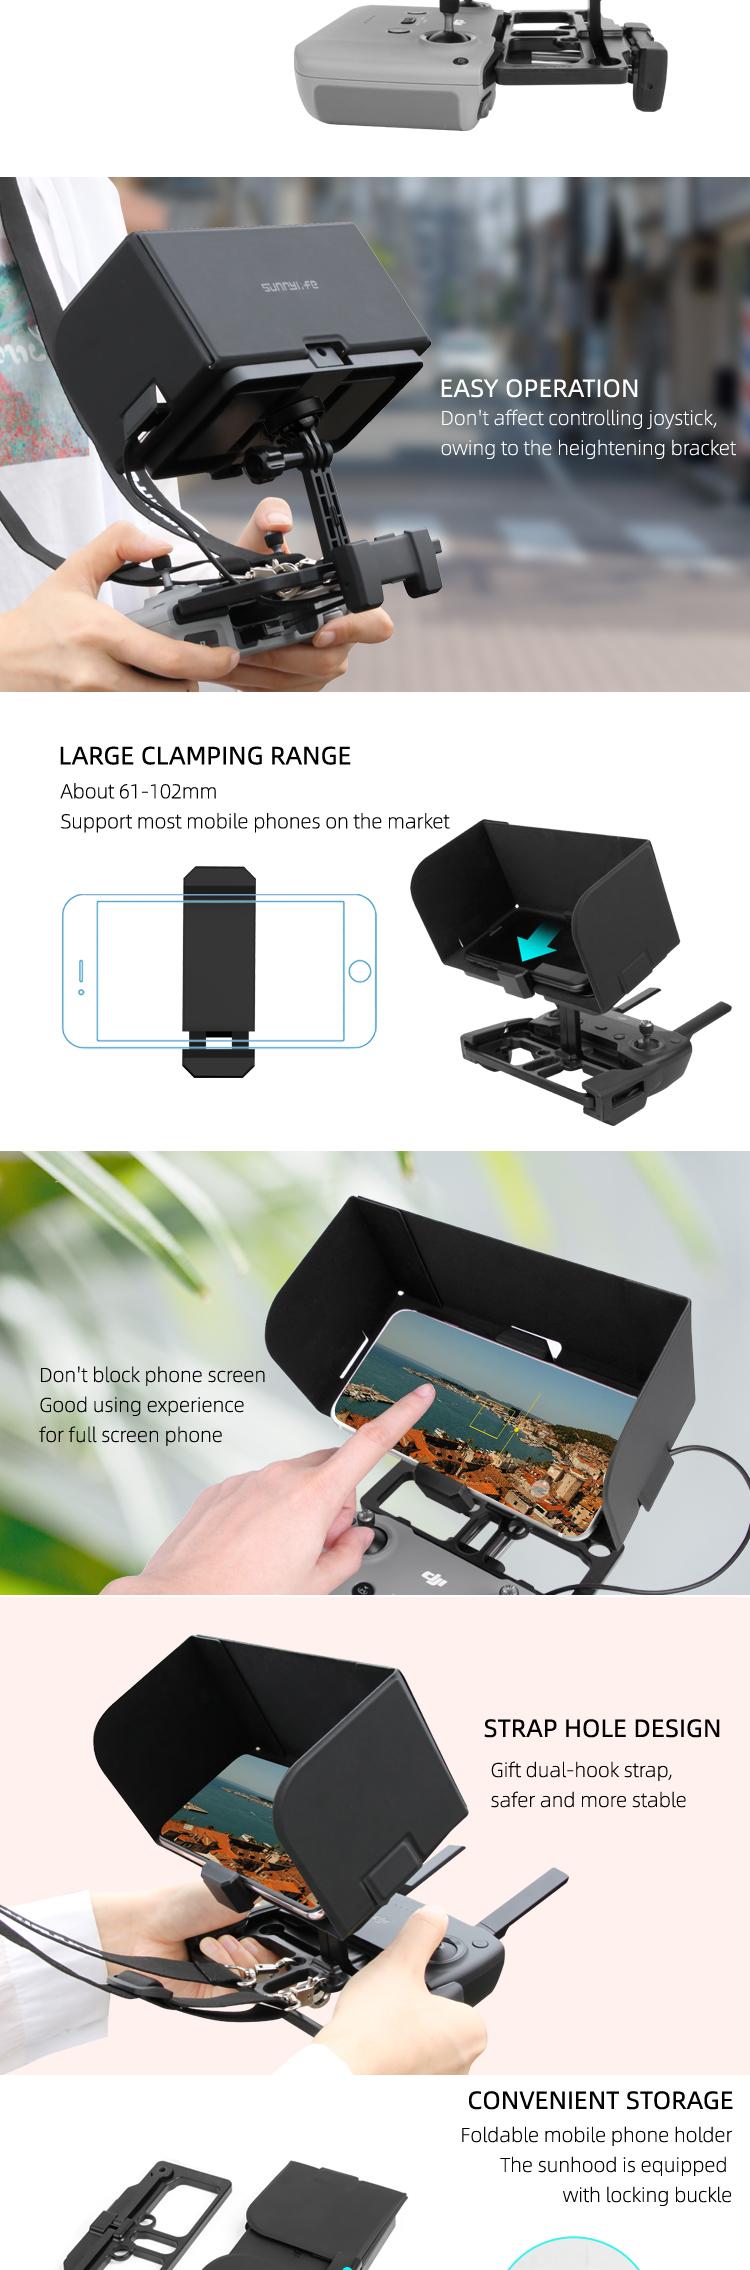 Sunnylife sunhood and phone holder for Mavic Air 2